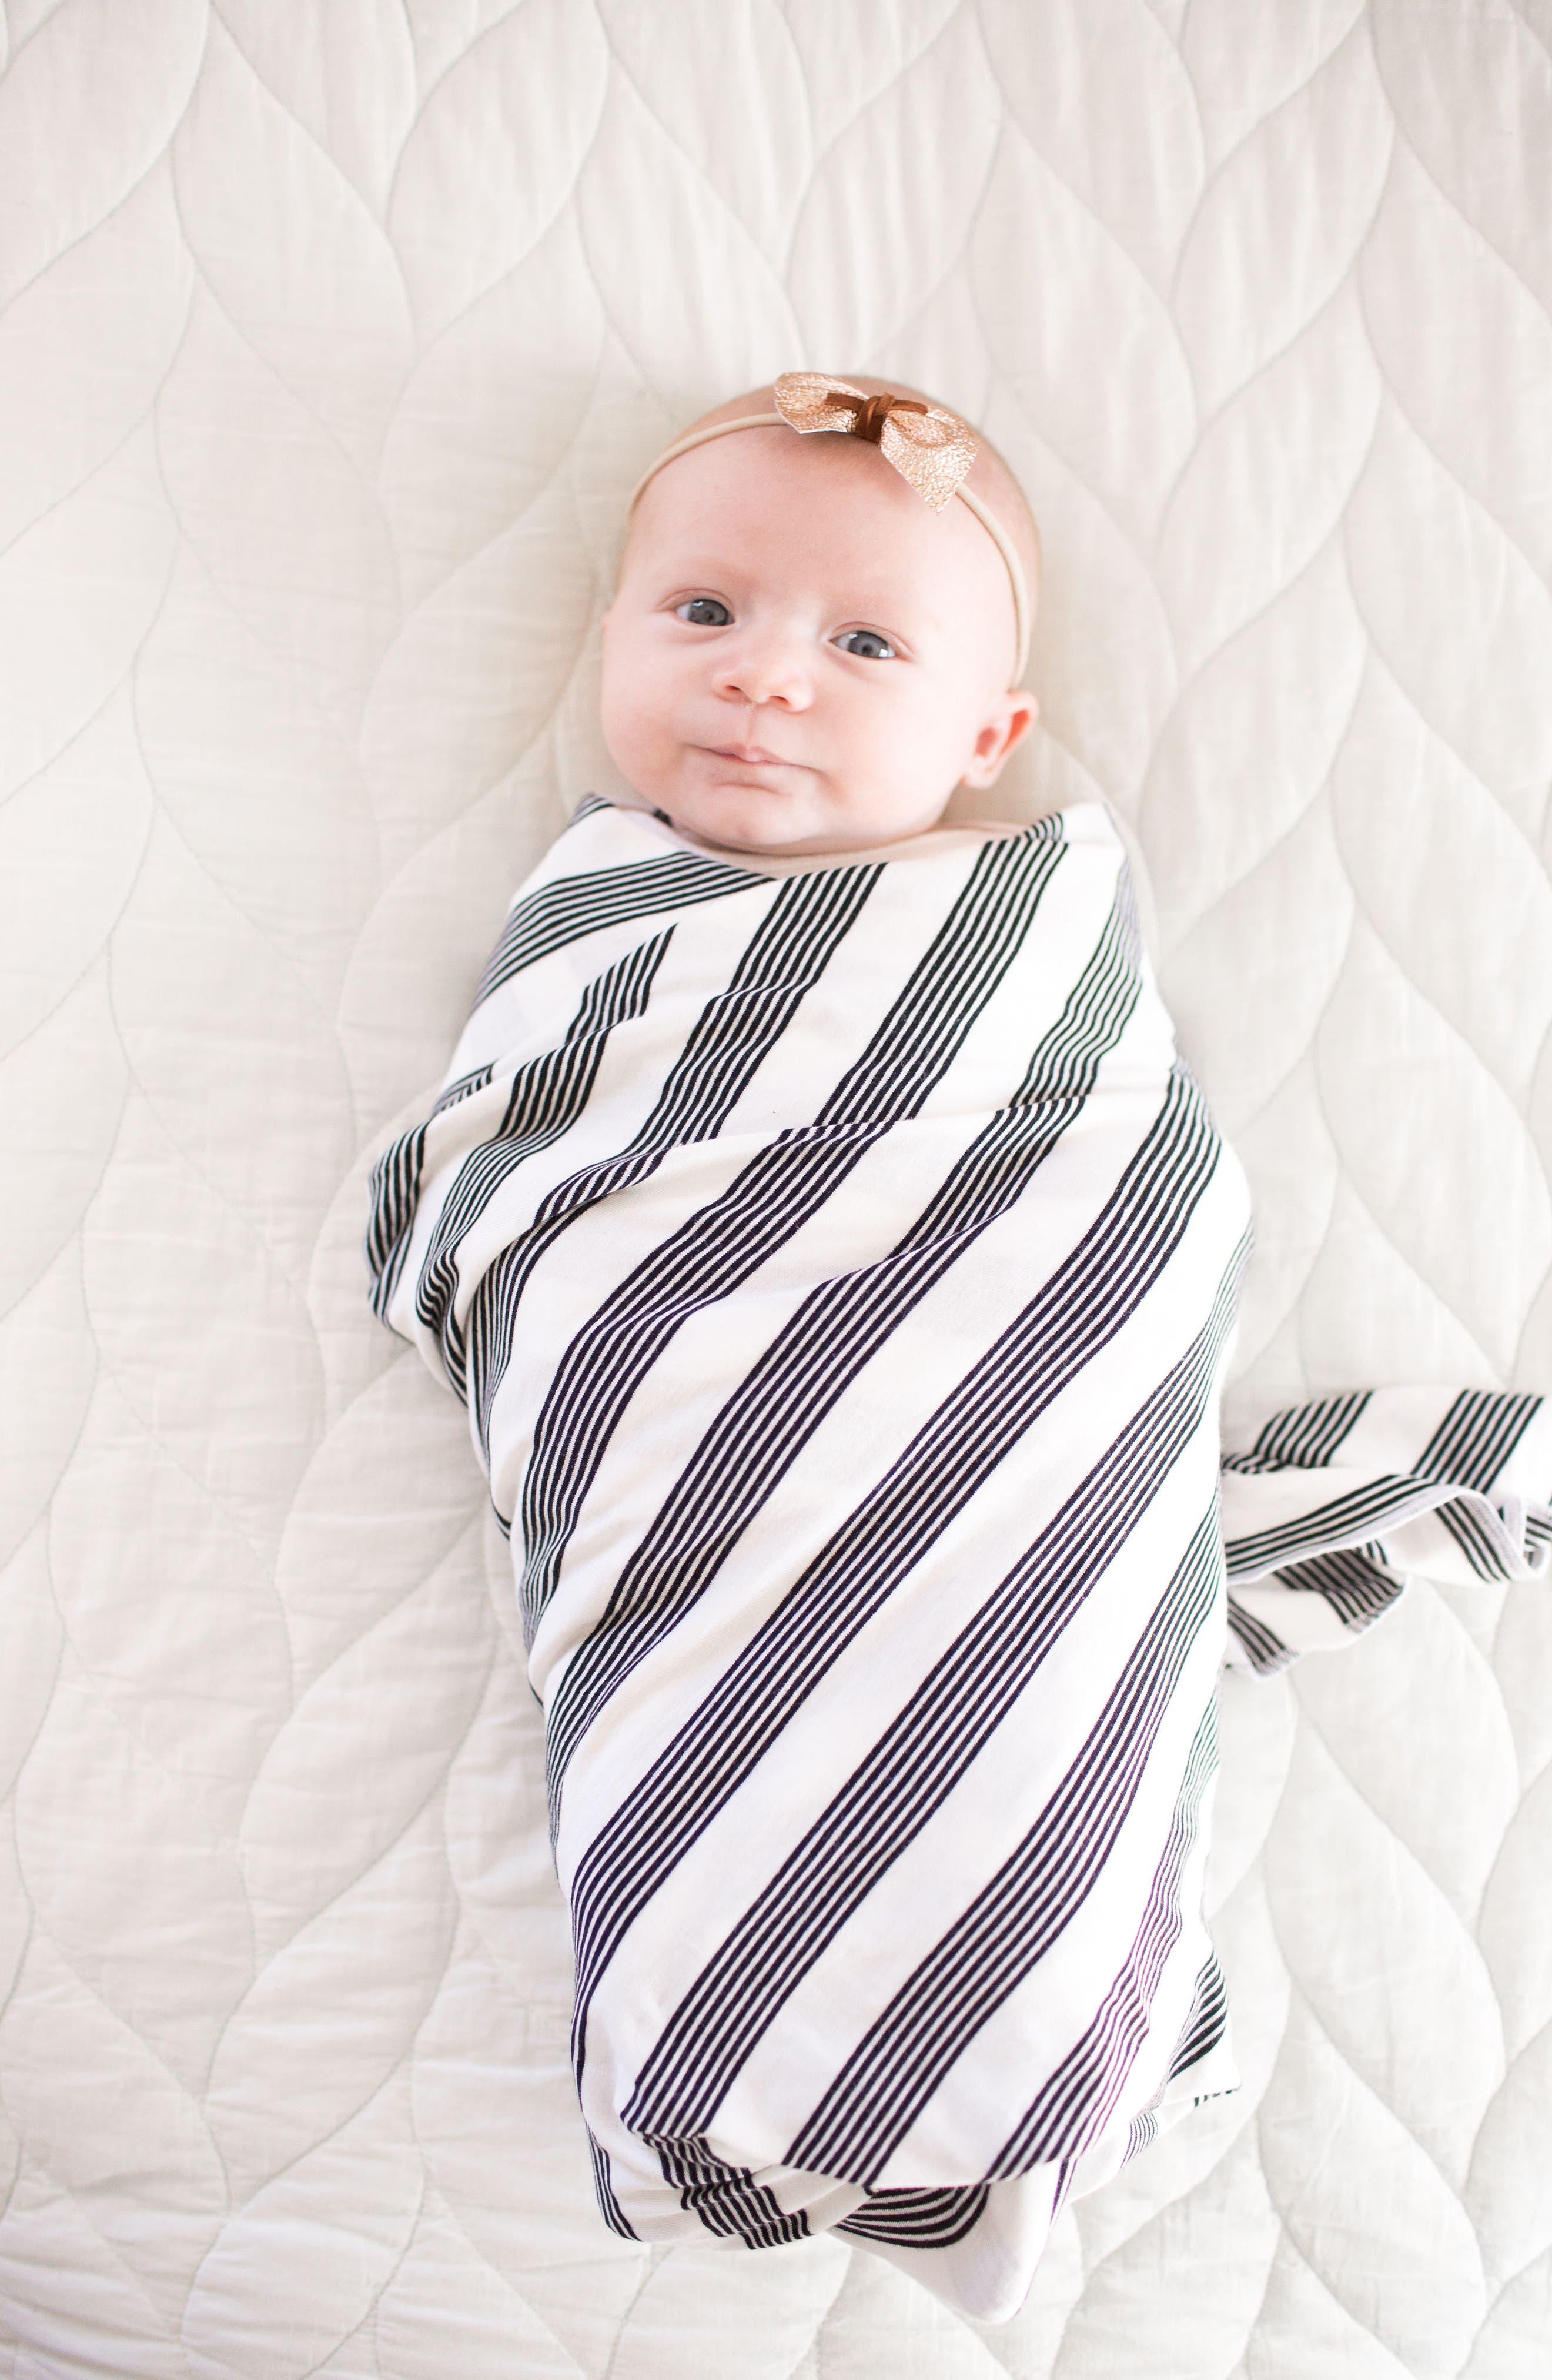 Alternate Image 2  - Copper Pearl Bloom Multiuse Cover & Swaddle Blanket Gift Set